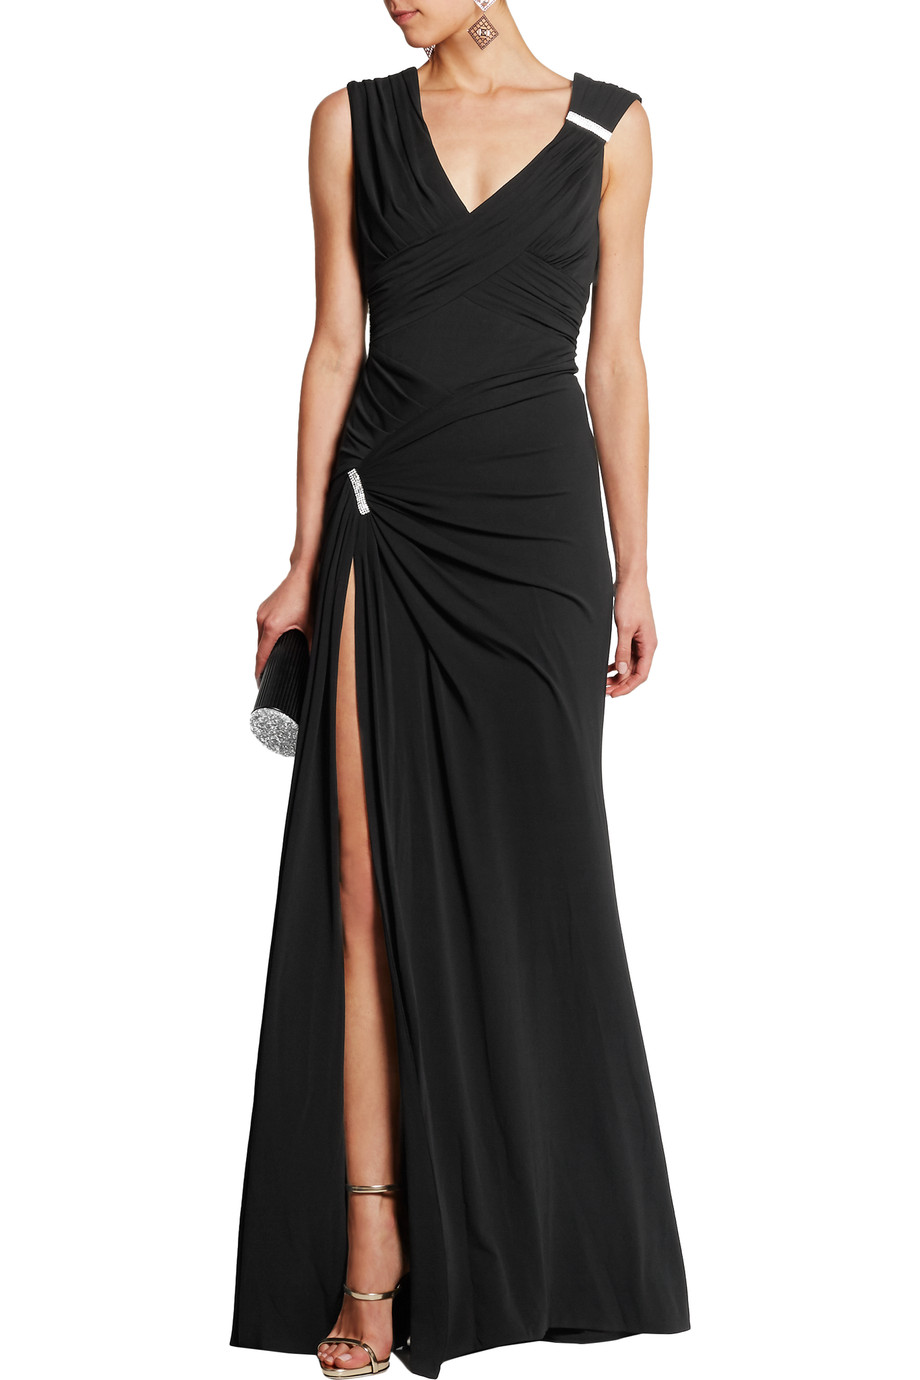 Versace Gown.jpg